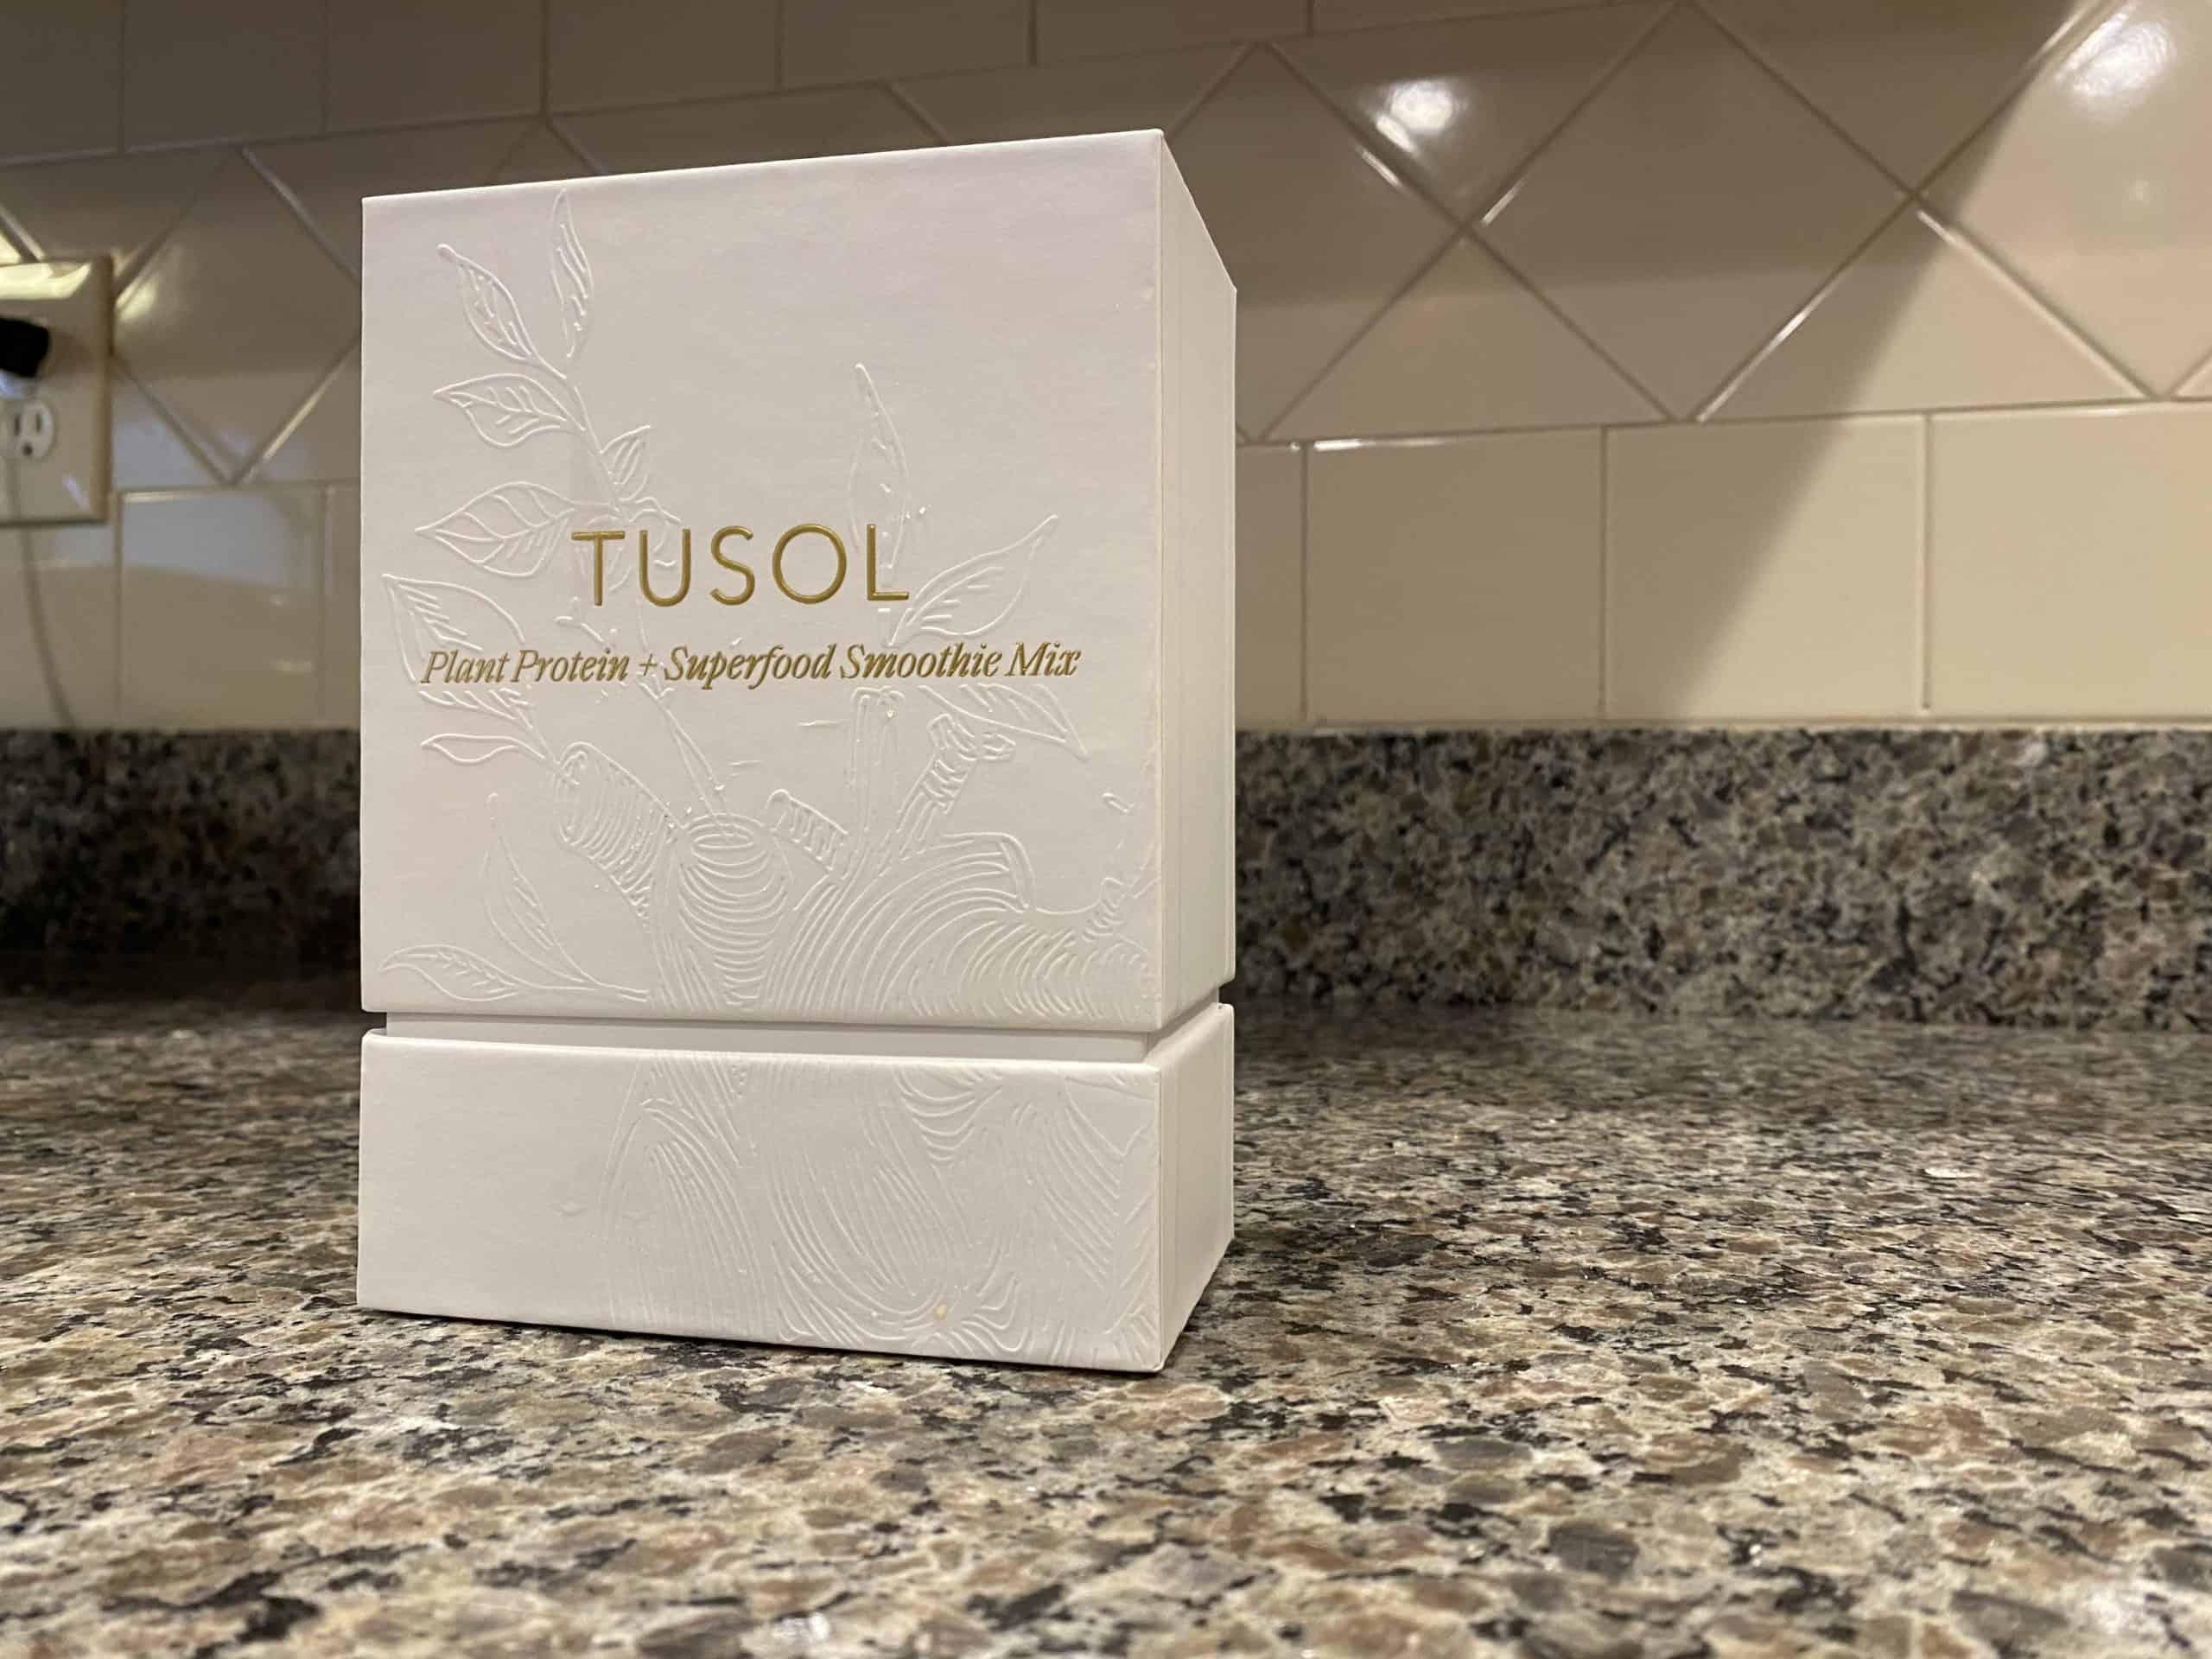 TUSOL wellness box mothers day gift idea